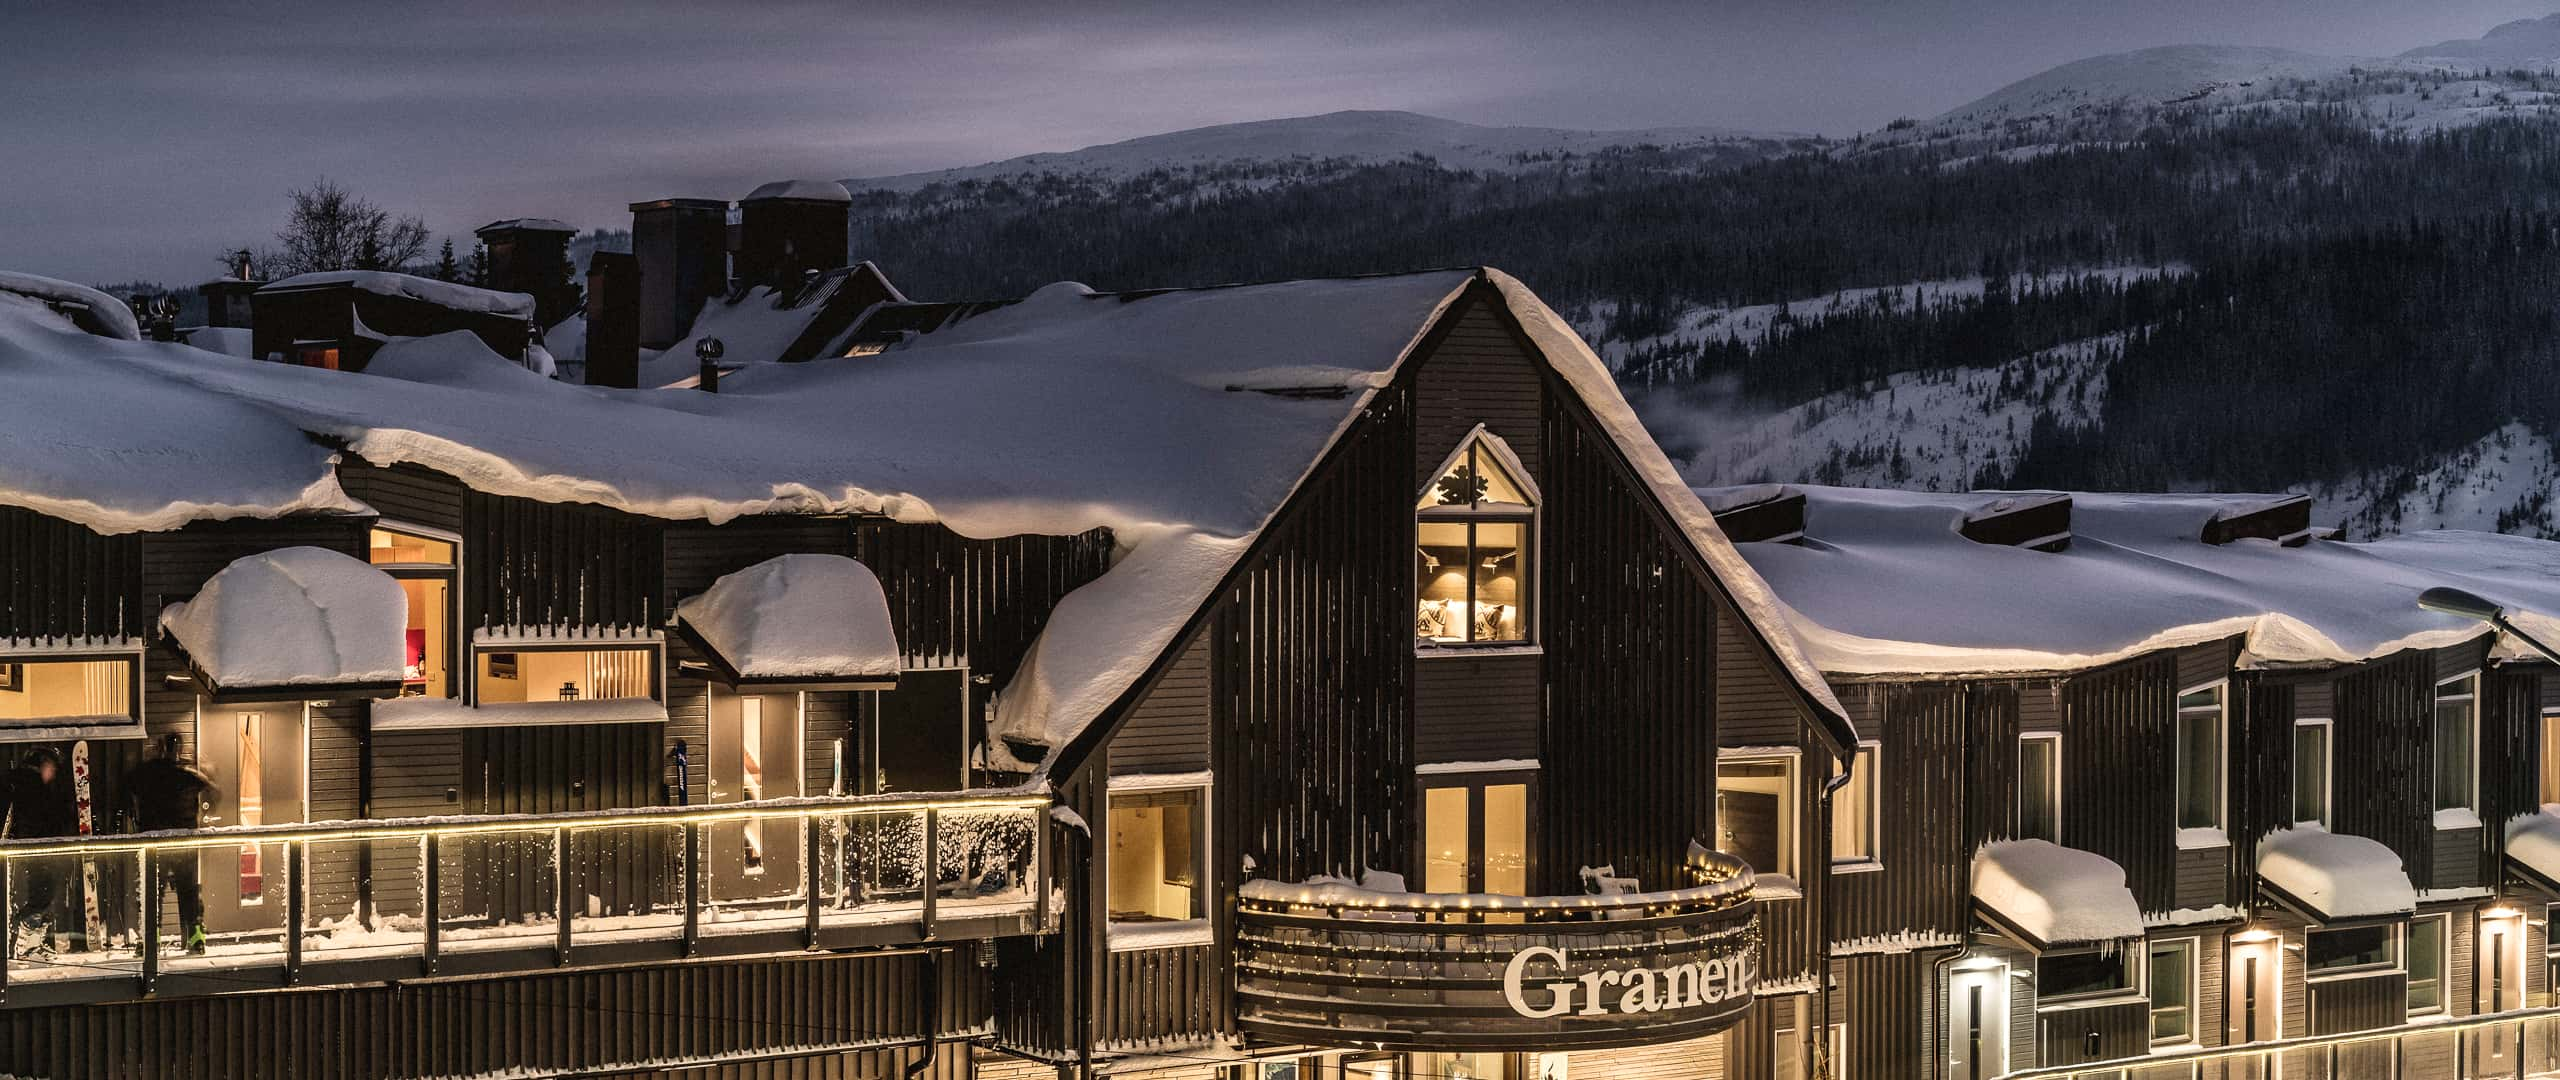 Hotell Åre Granen